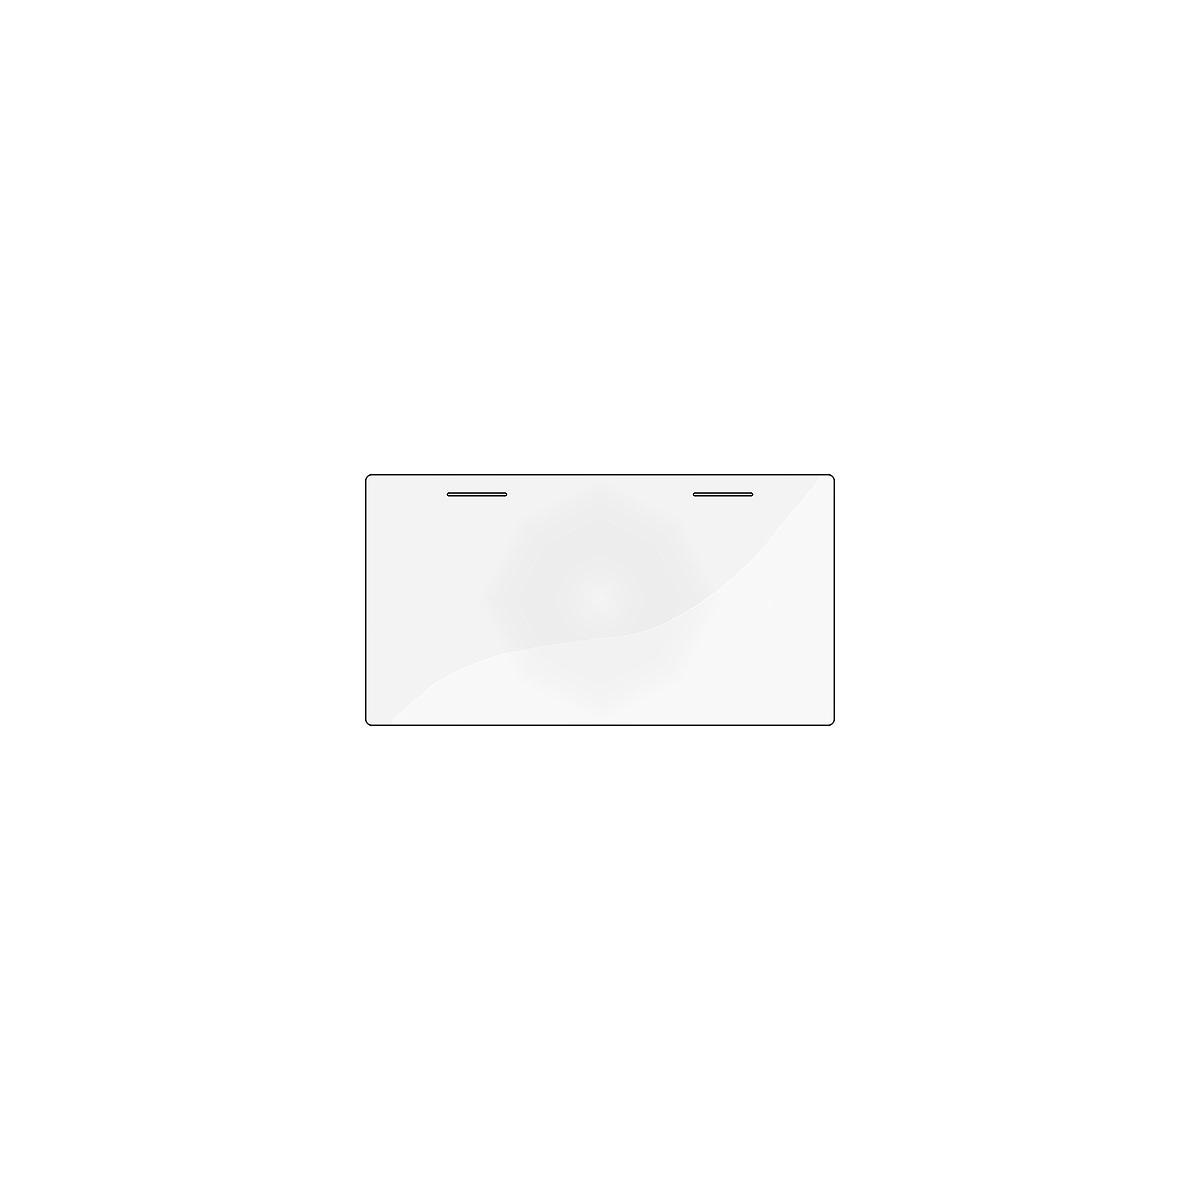 Protector Escritorio tablero inclinable CLASSIC Flexa transparente